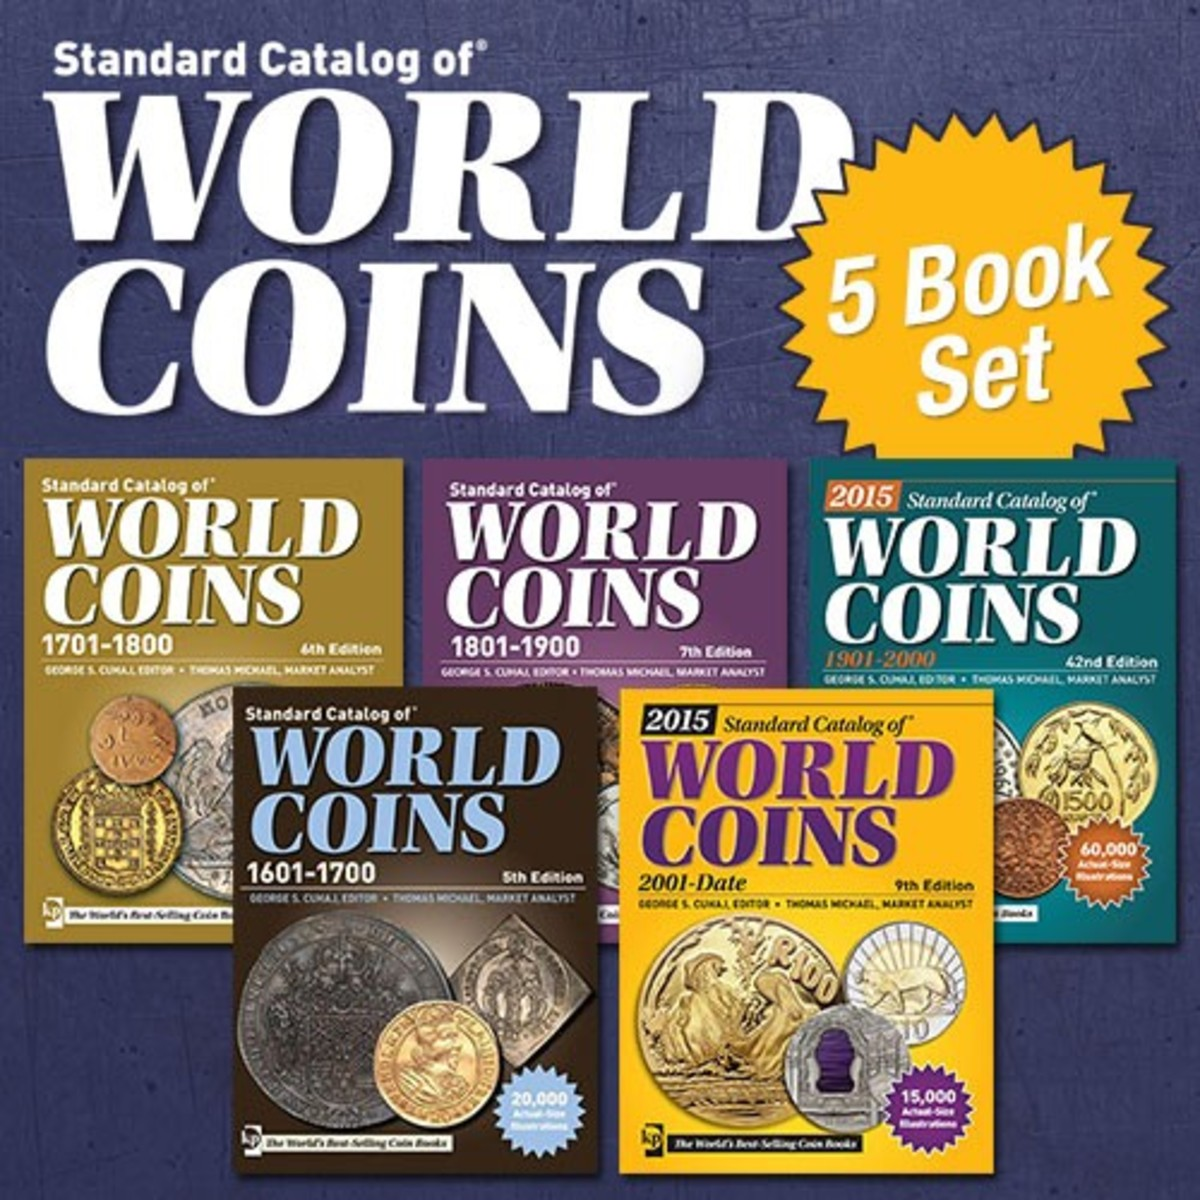 Standard Catalog of World Coins 5 Book Set